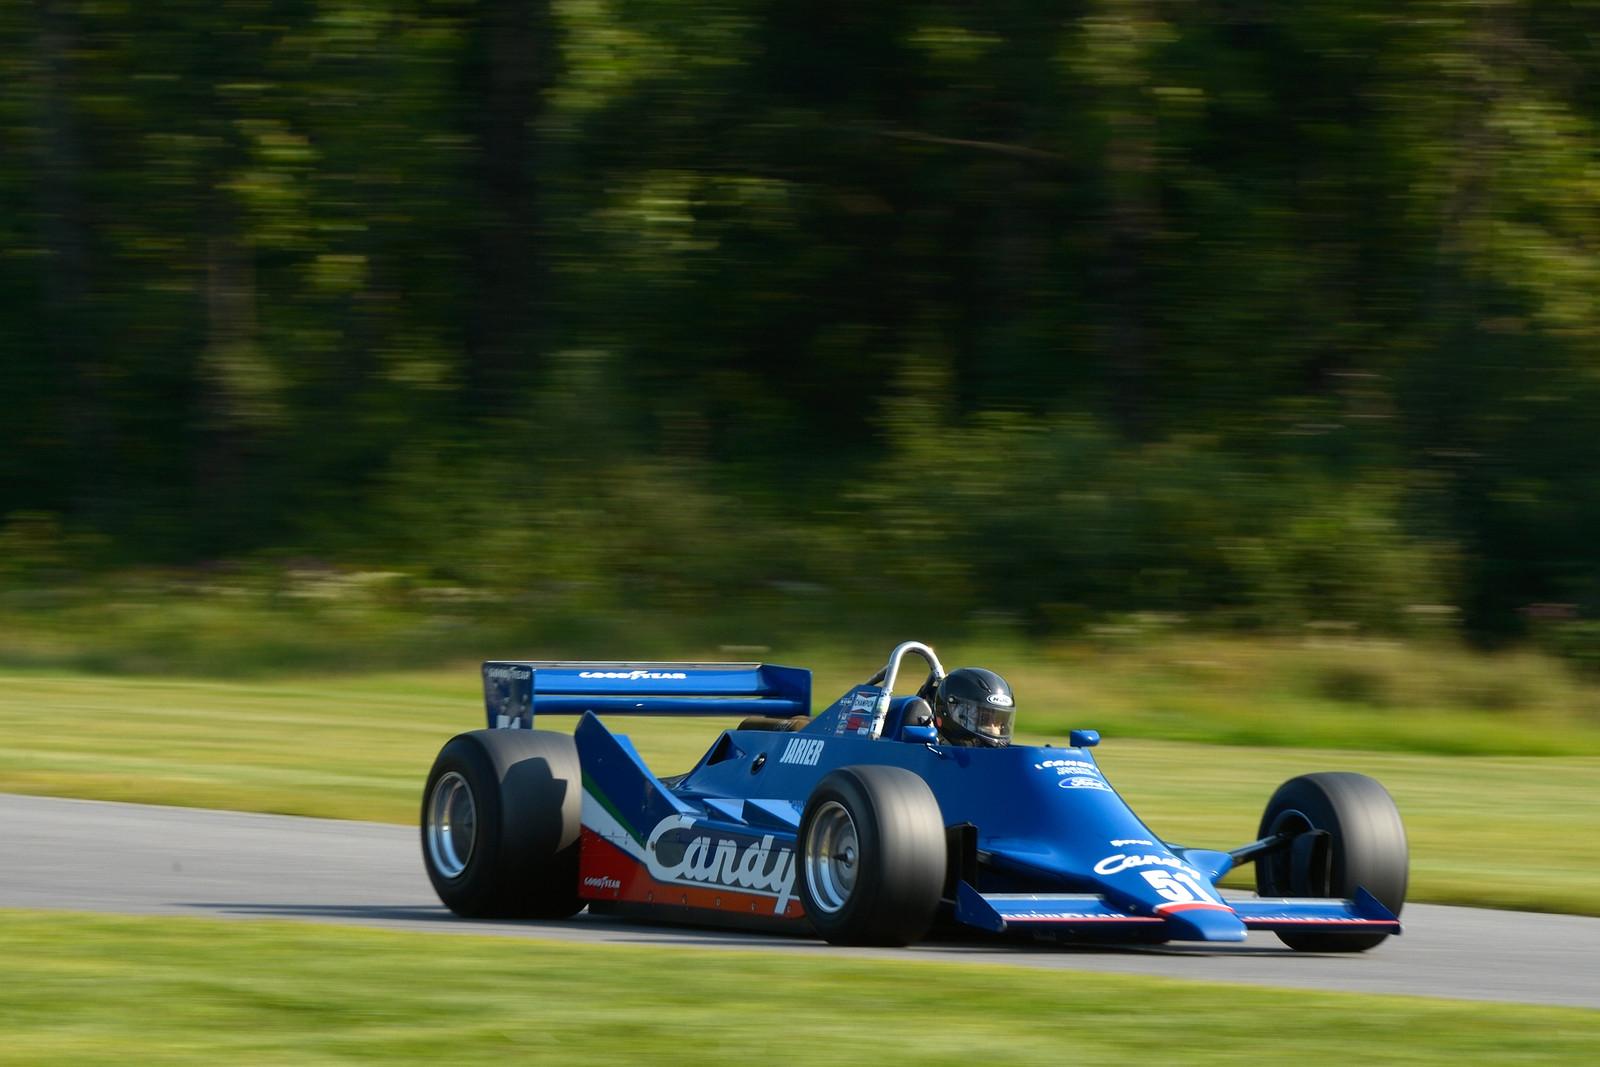 retro car racing